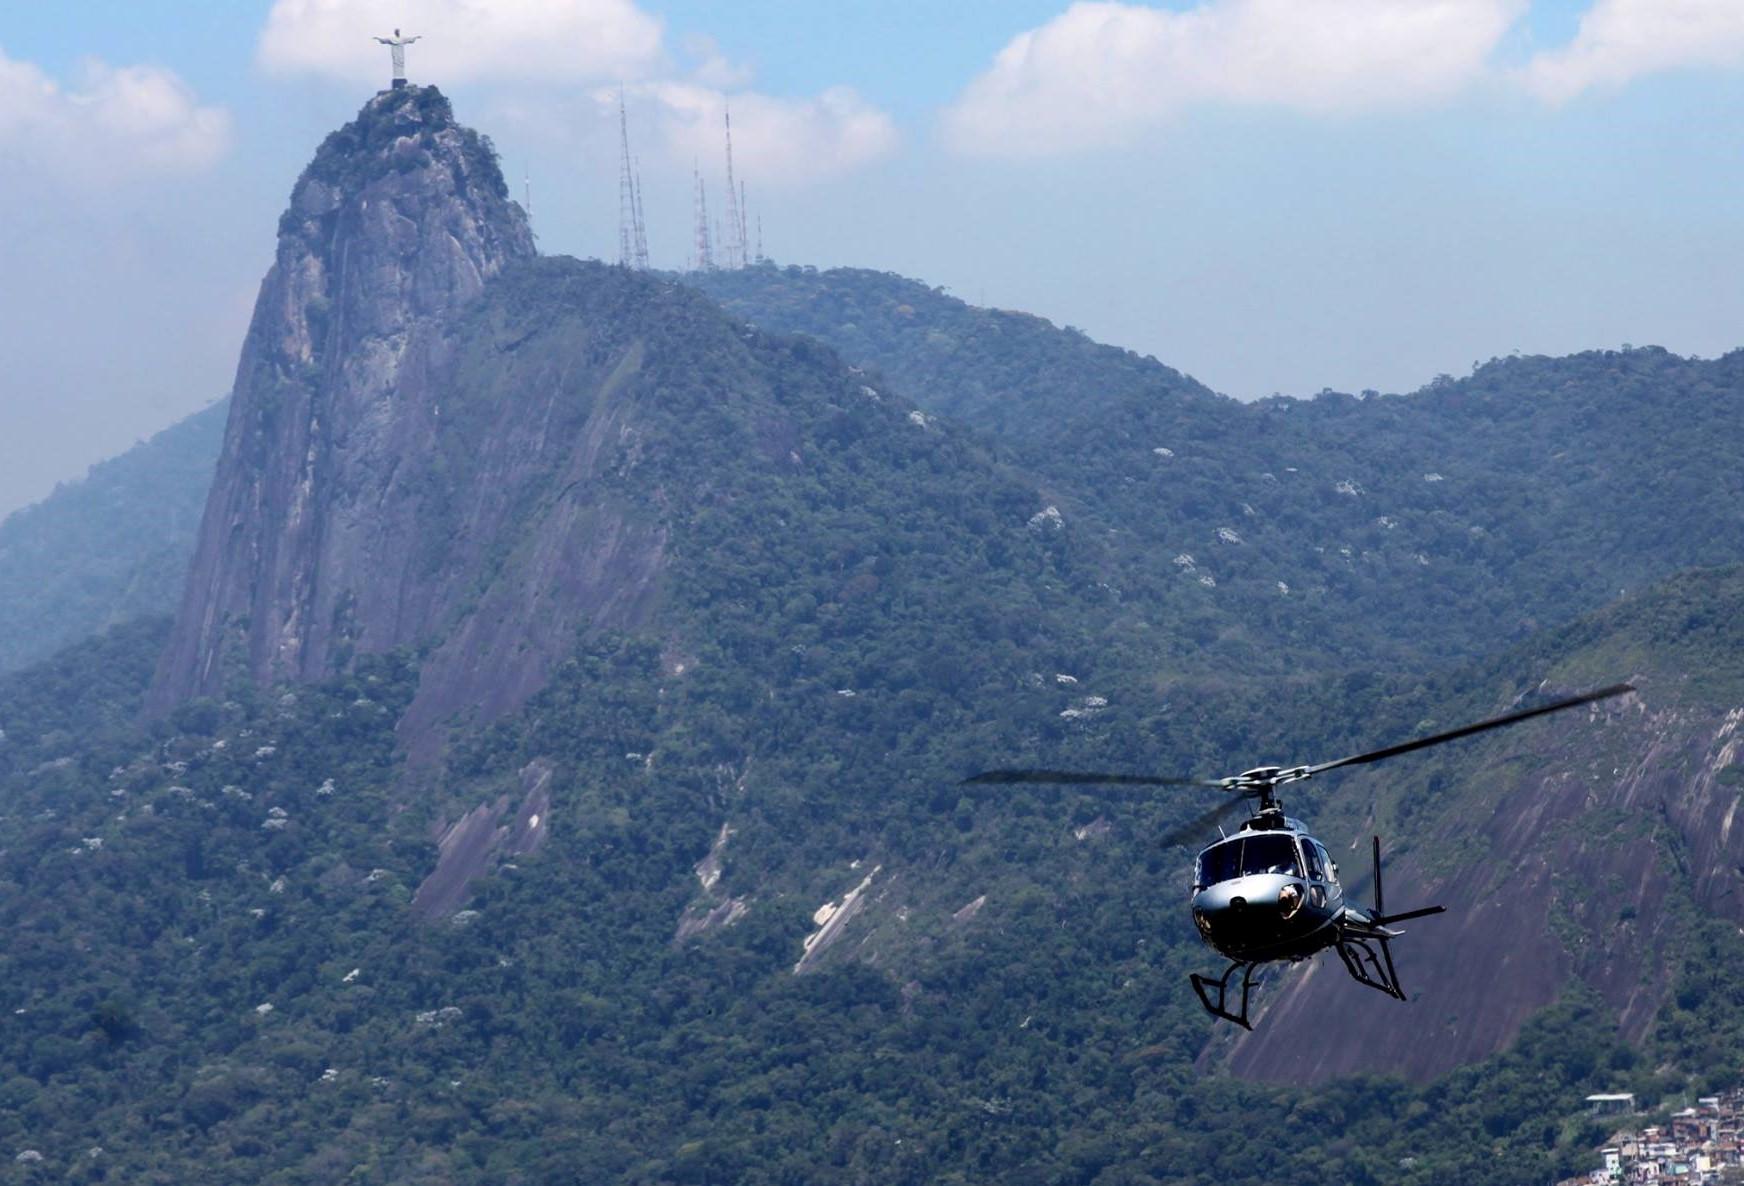 Nova Iguaçu (Miguel Couto)/RJ - Sugarloaf